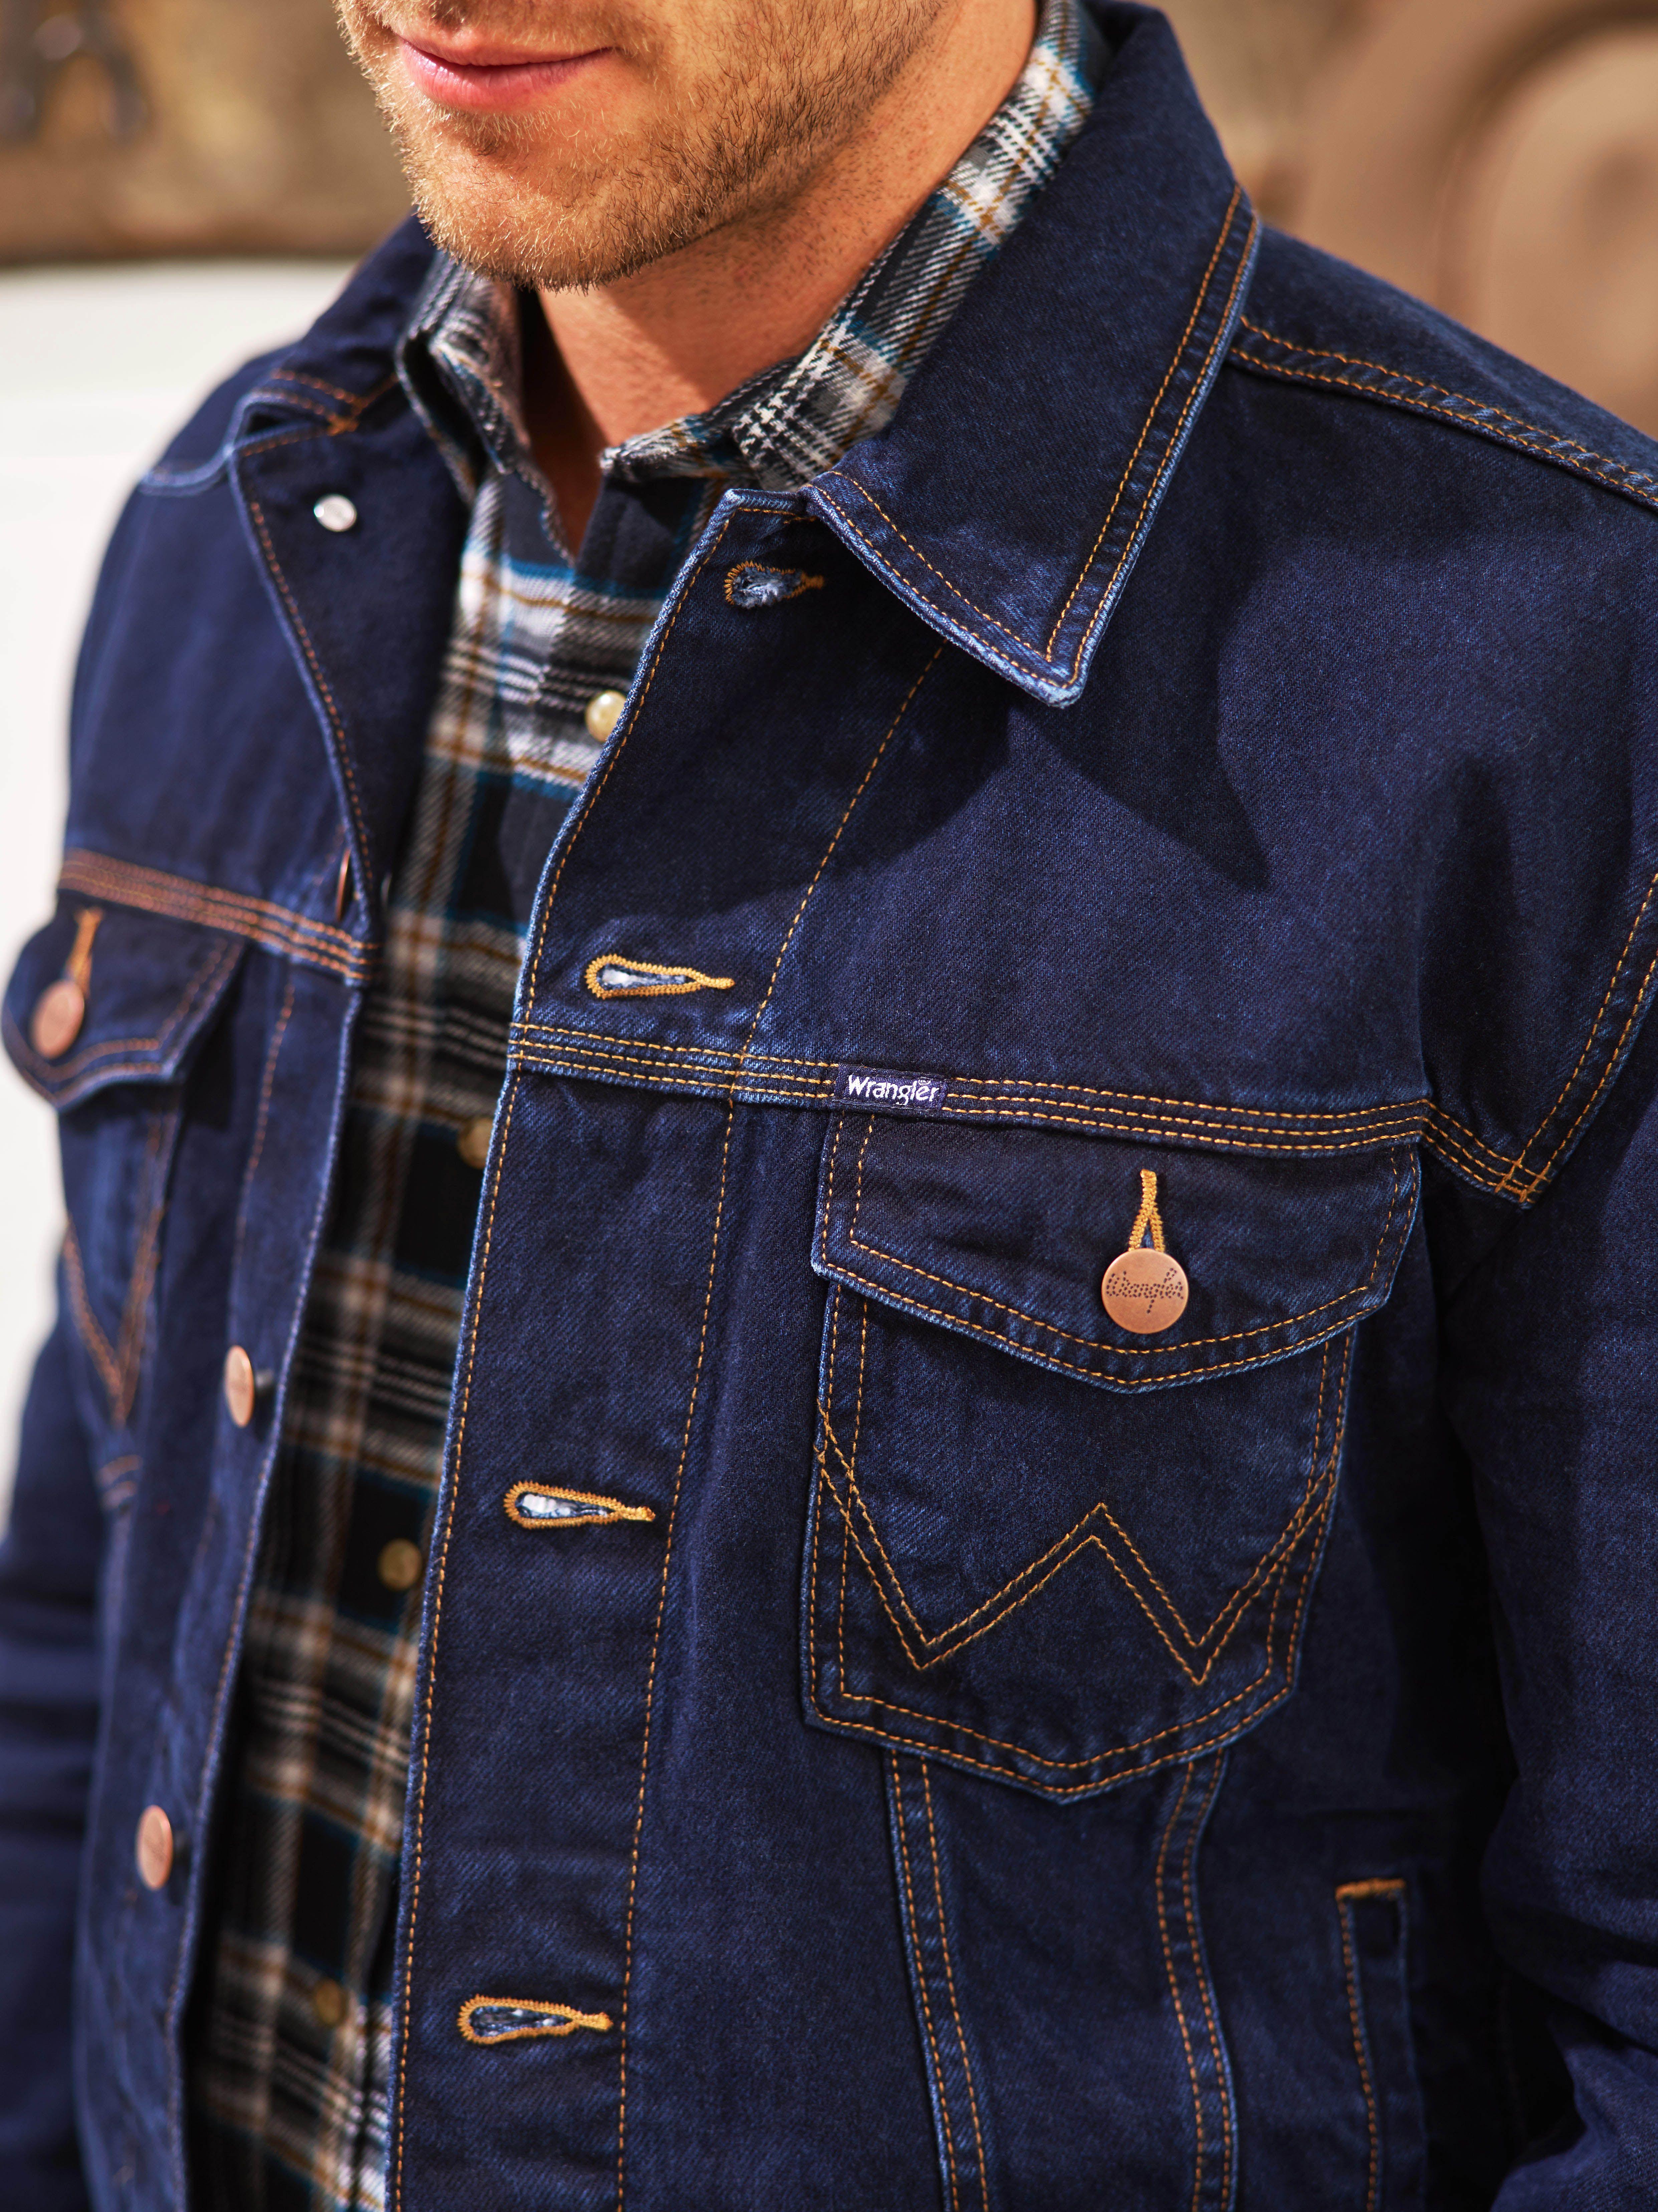 Wrangler Jeans Jacket Denim Shirt With Jeans Denim Jacket Men Wrangler Jeans [ 6624 x 4966 Pixel ]